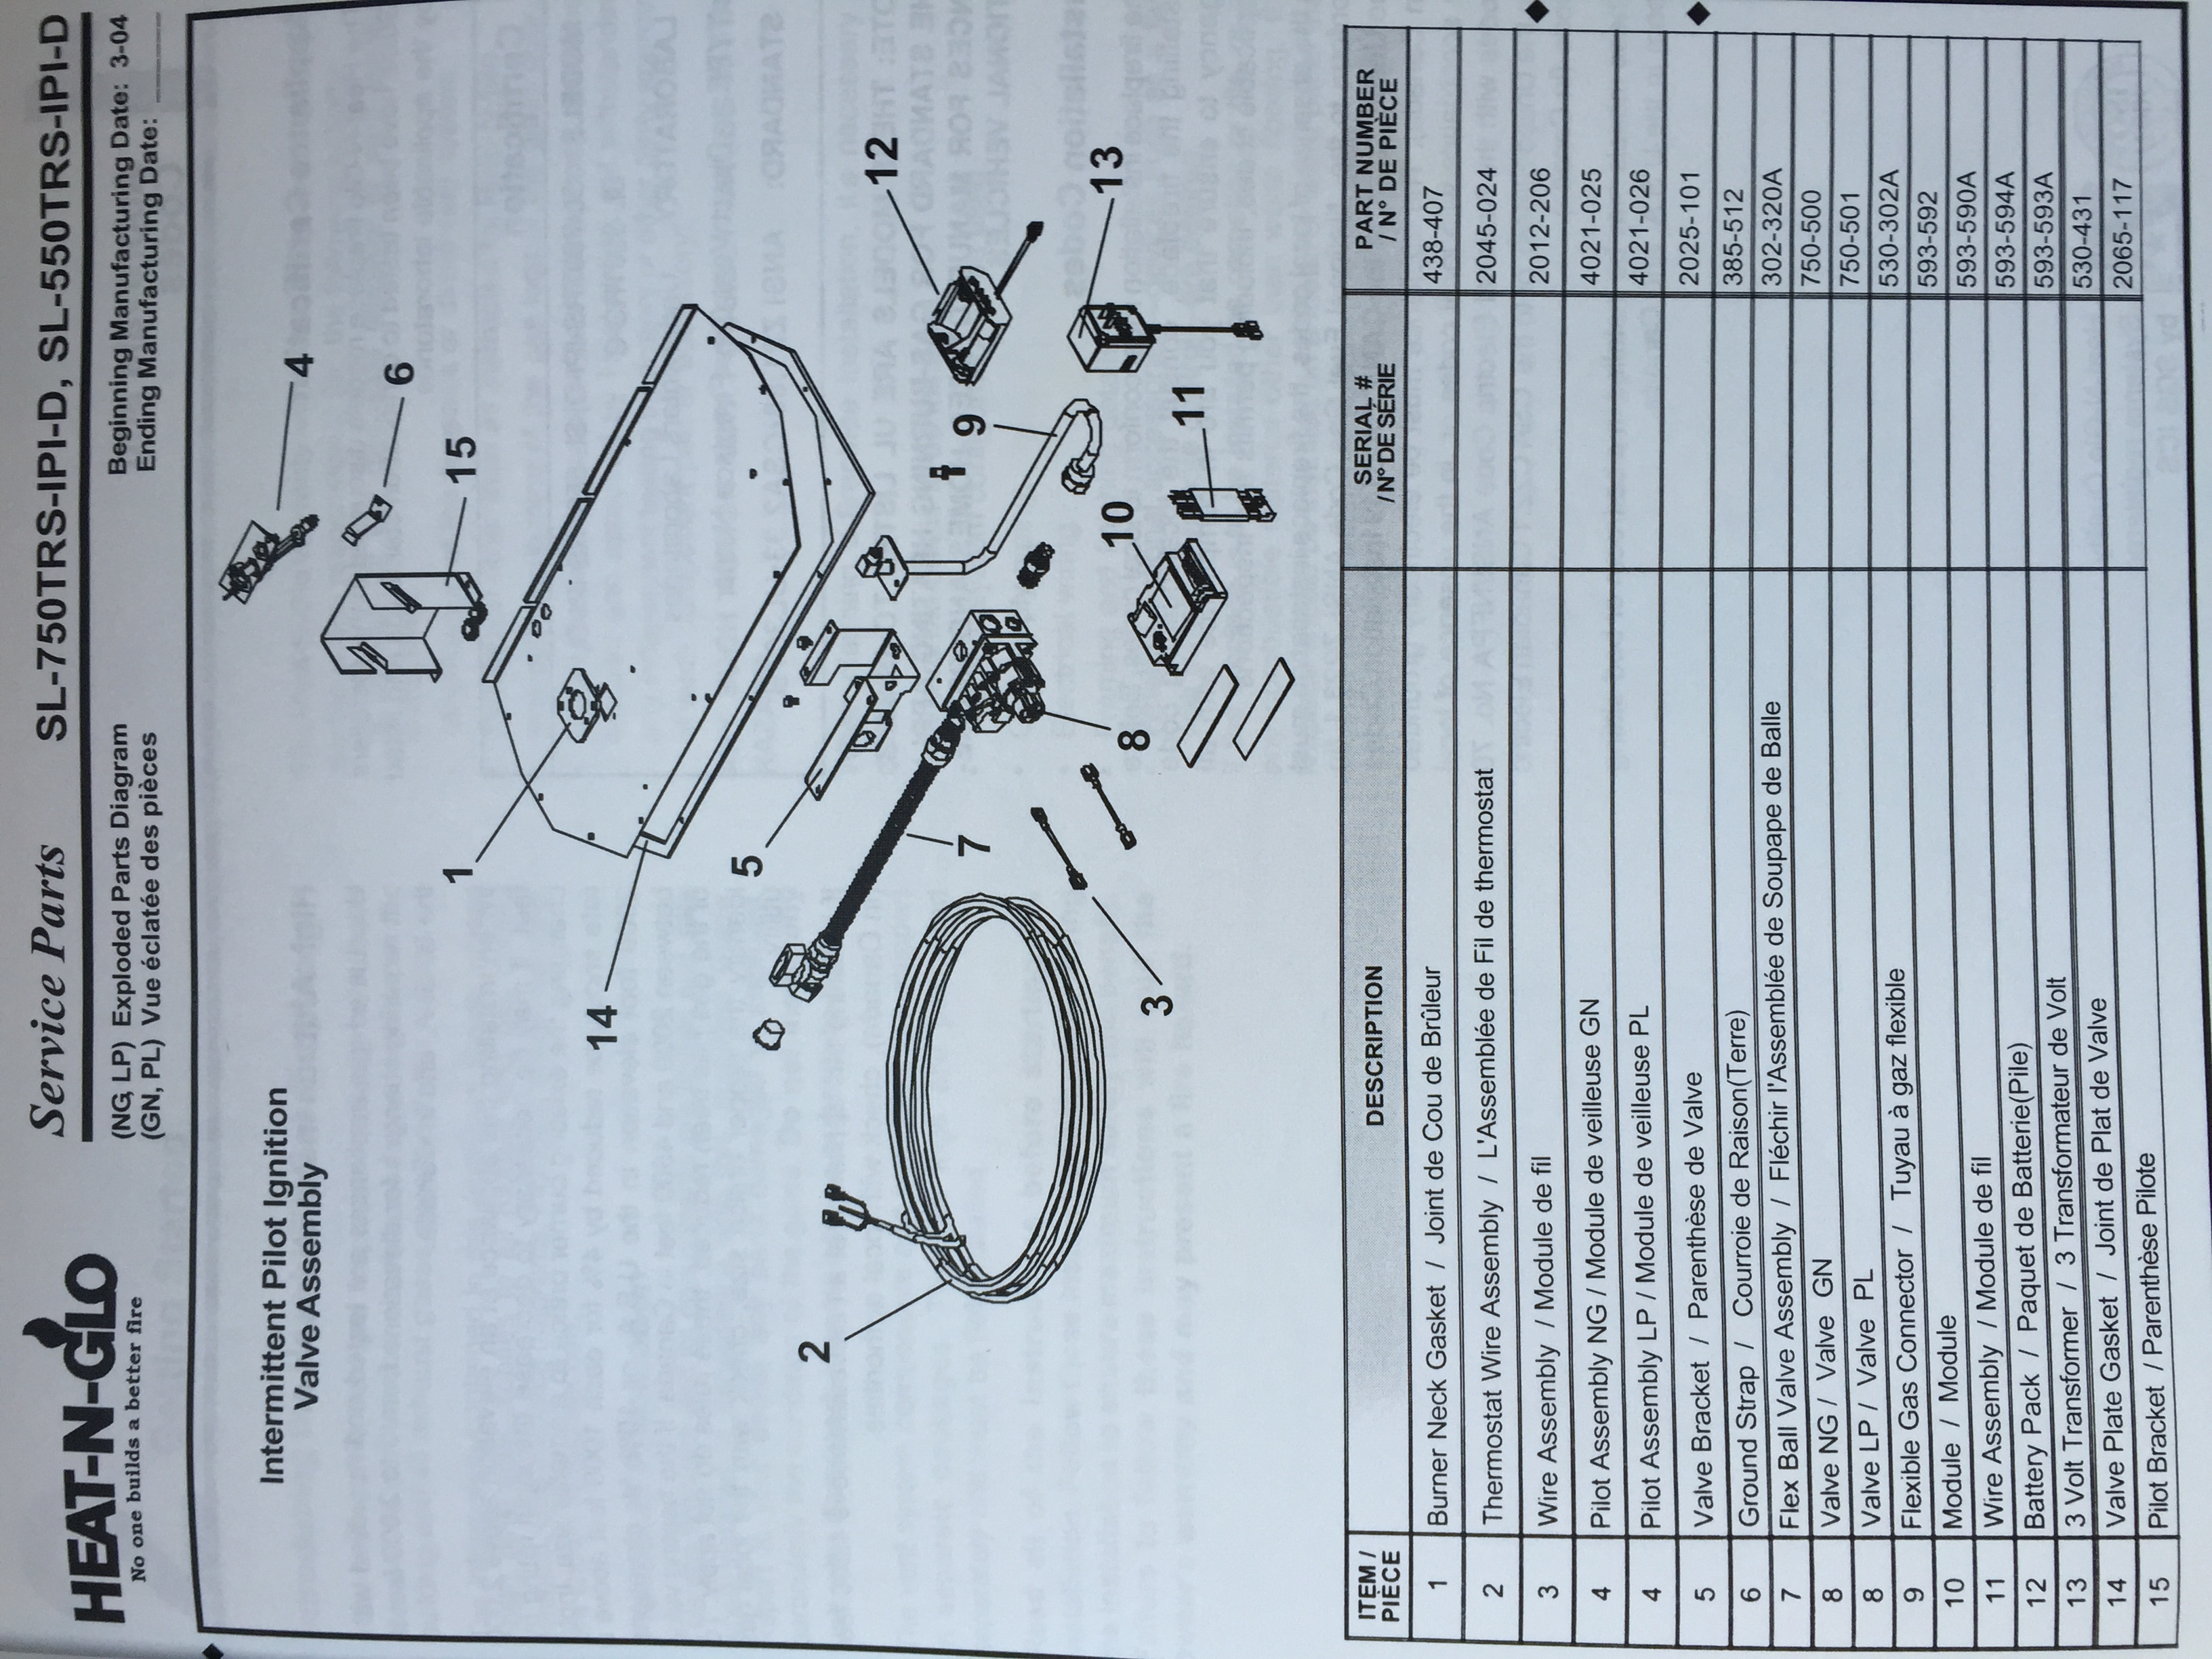 Heat N Glo Gas Fireplace Manual ~ usrmanual.com